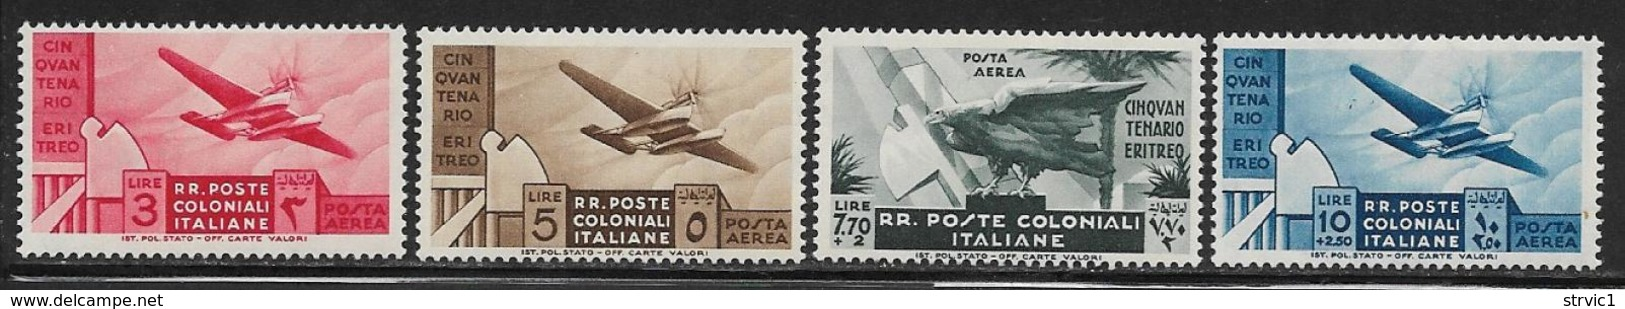 Italian Colonies Scott # C15-8 Mint Hinged Plane,Map, 1933, CV$114.00 - General Issues